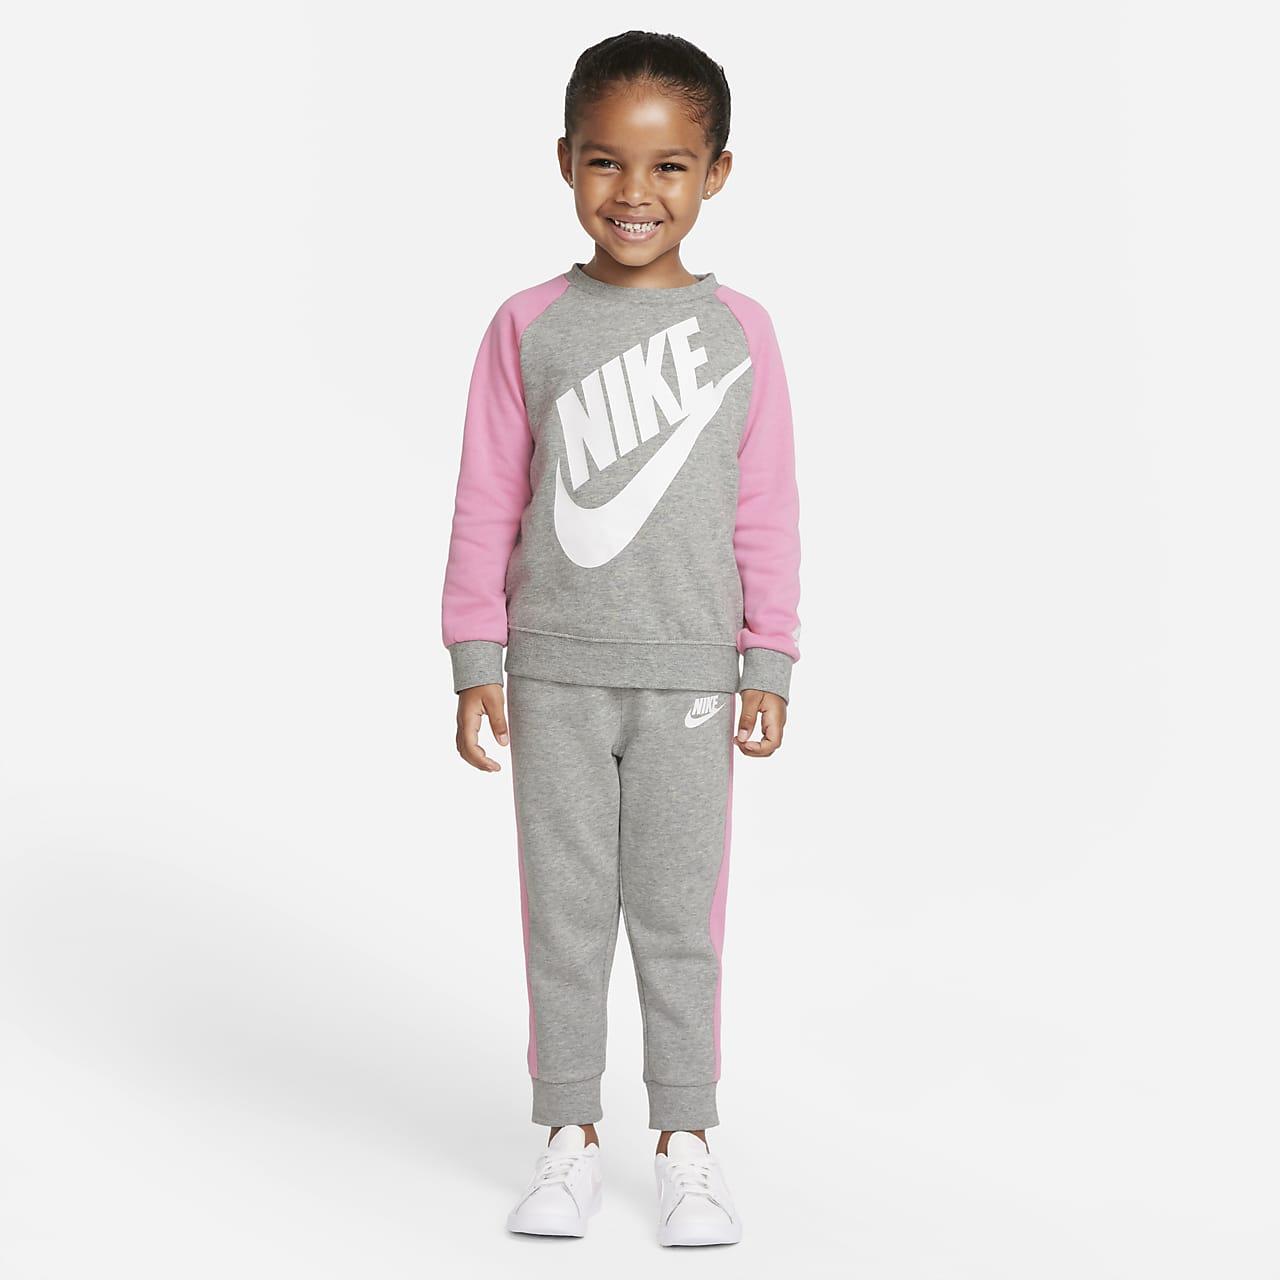 Ensemble haut et pantalon Nike pour Petit enfant